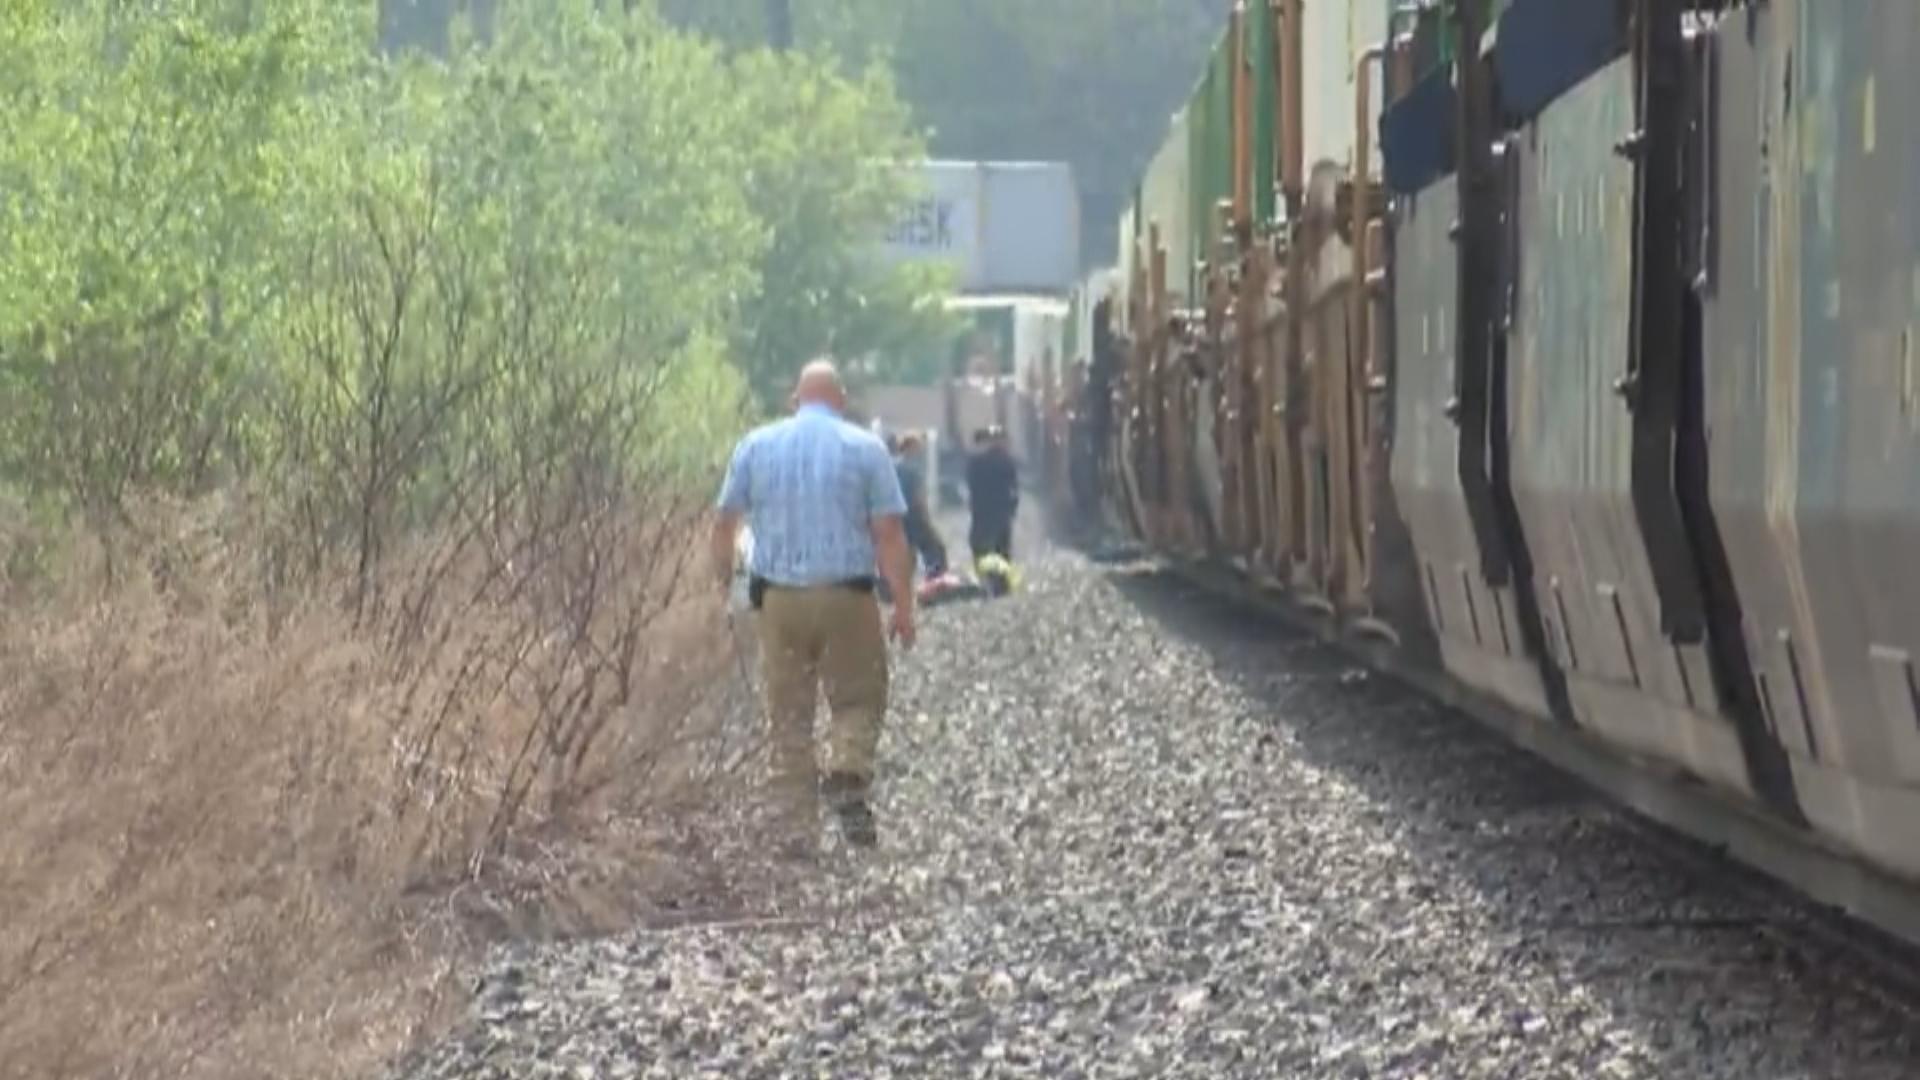 train vs ped vo_1558384357500.jpg.jpg